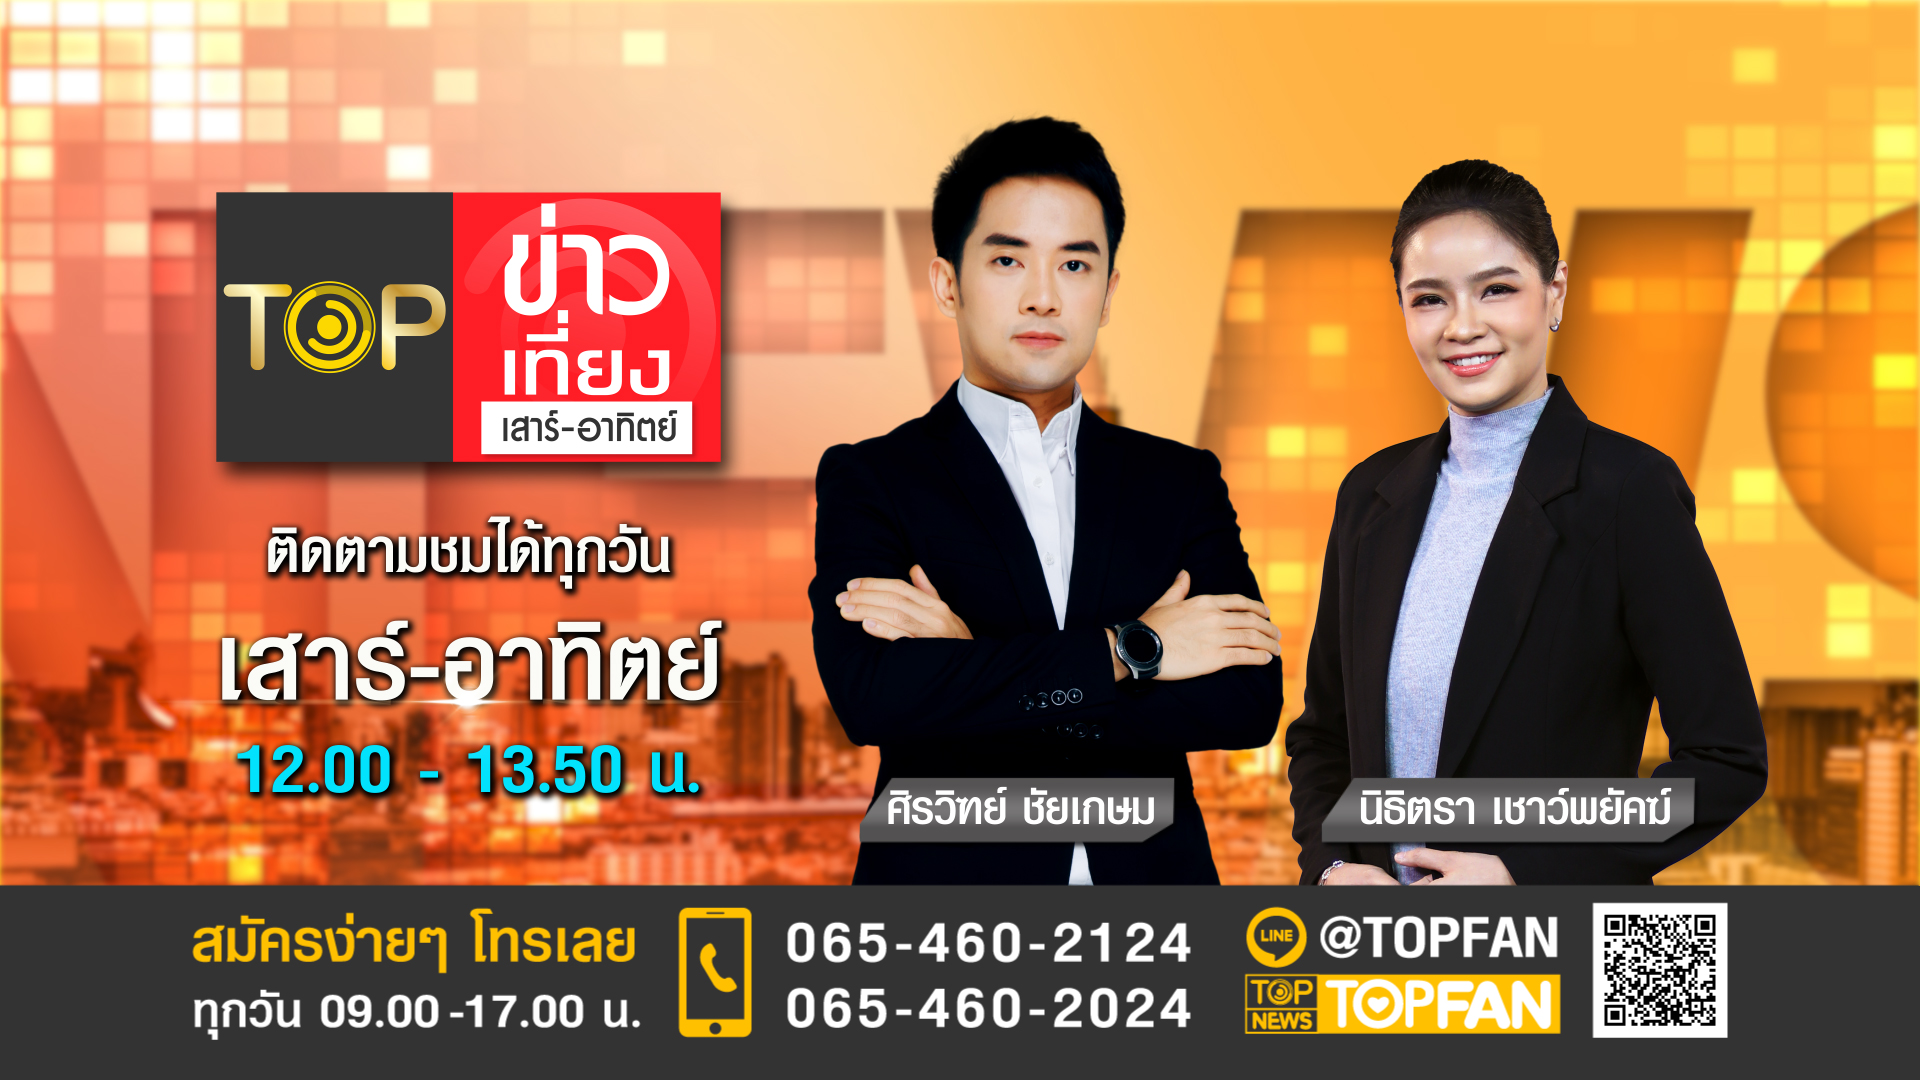 TOP ข่าวเที่ยง เสาร์ – อาทิตย์ | 25 กันยายน 2564